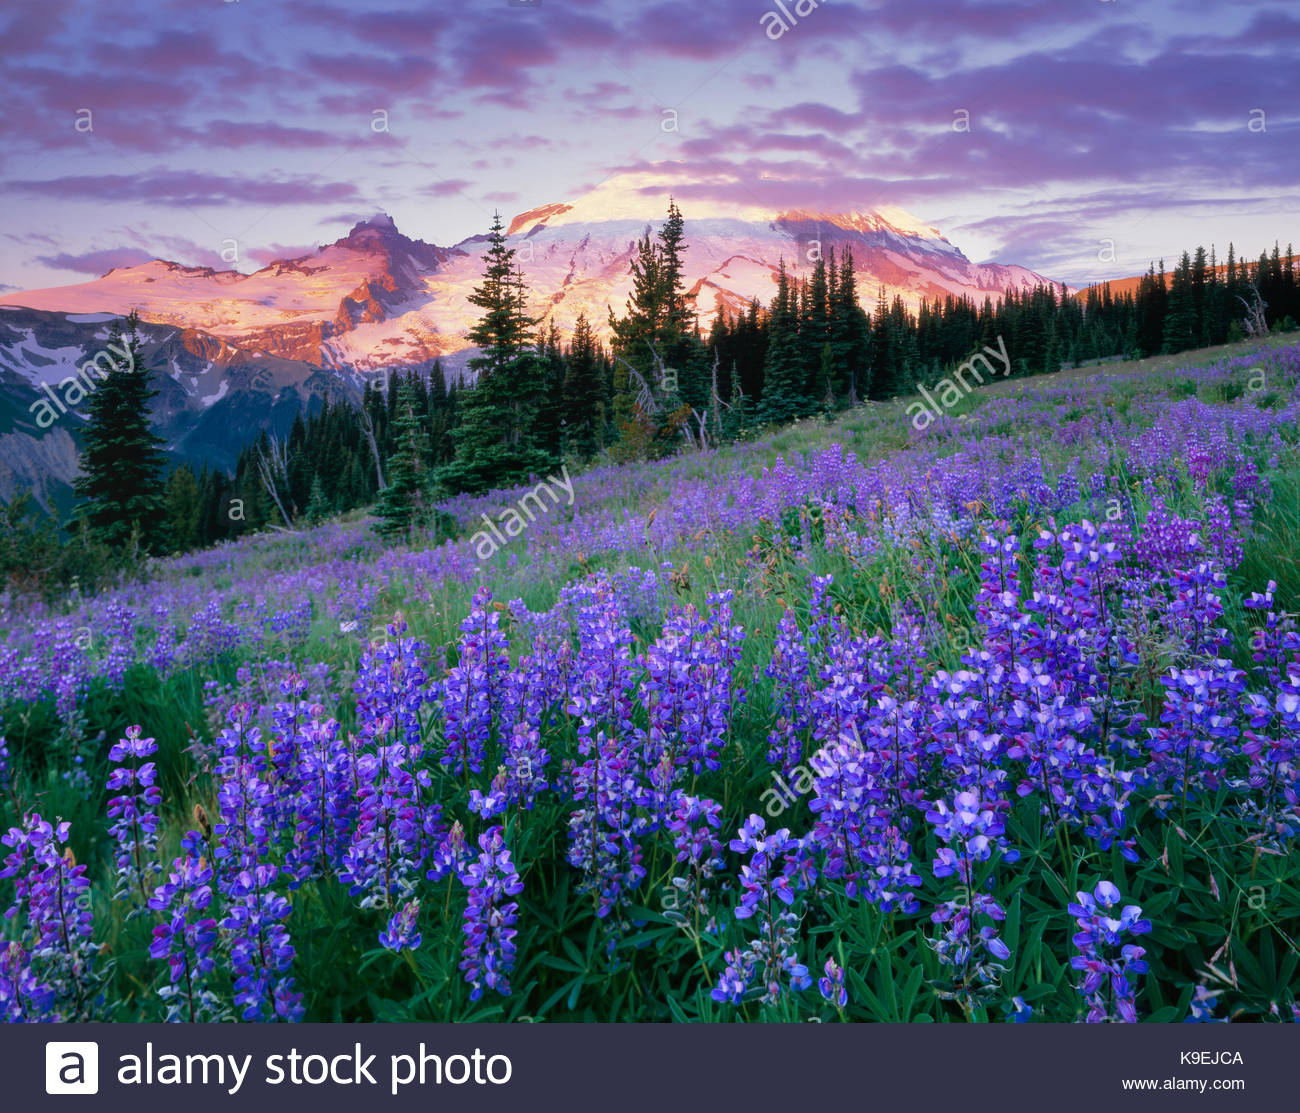 Wildflowers at Sunrise, Mount Rainier National Park, Washington - Stock Image